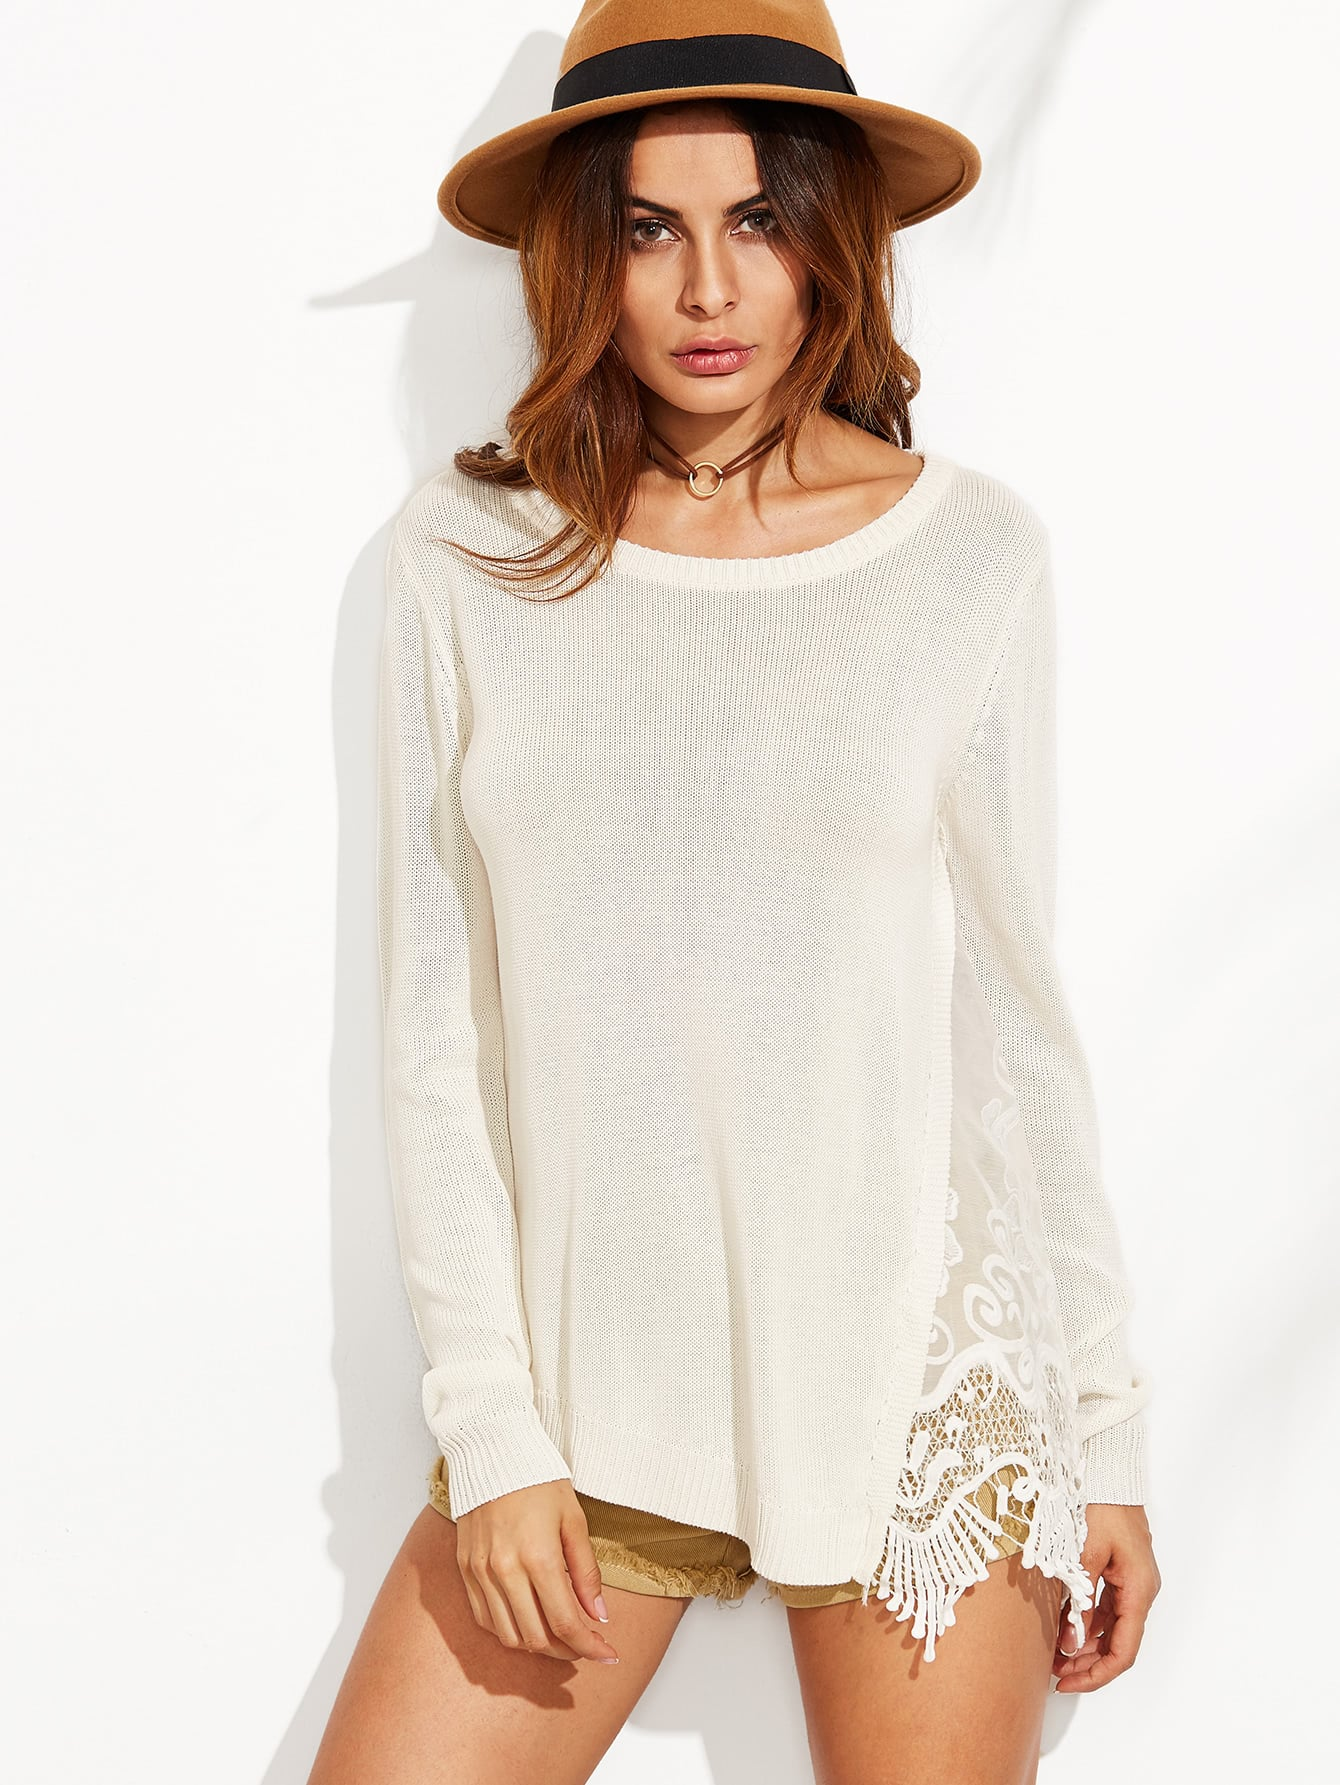 White Lace Insert Asymmetric SweaterWhite Lace Insert Asymmetric Sweater<br><br>color: White<br>size: one-size